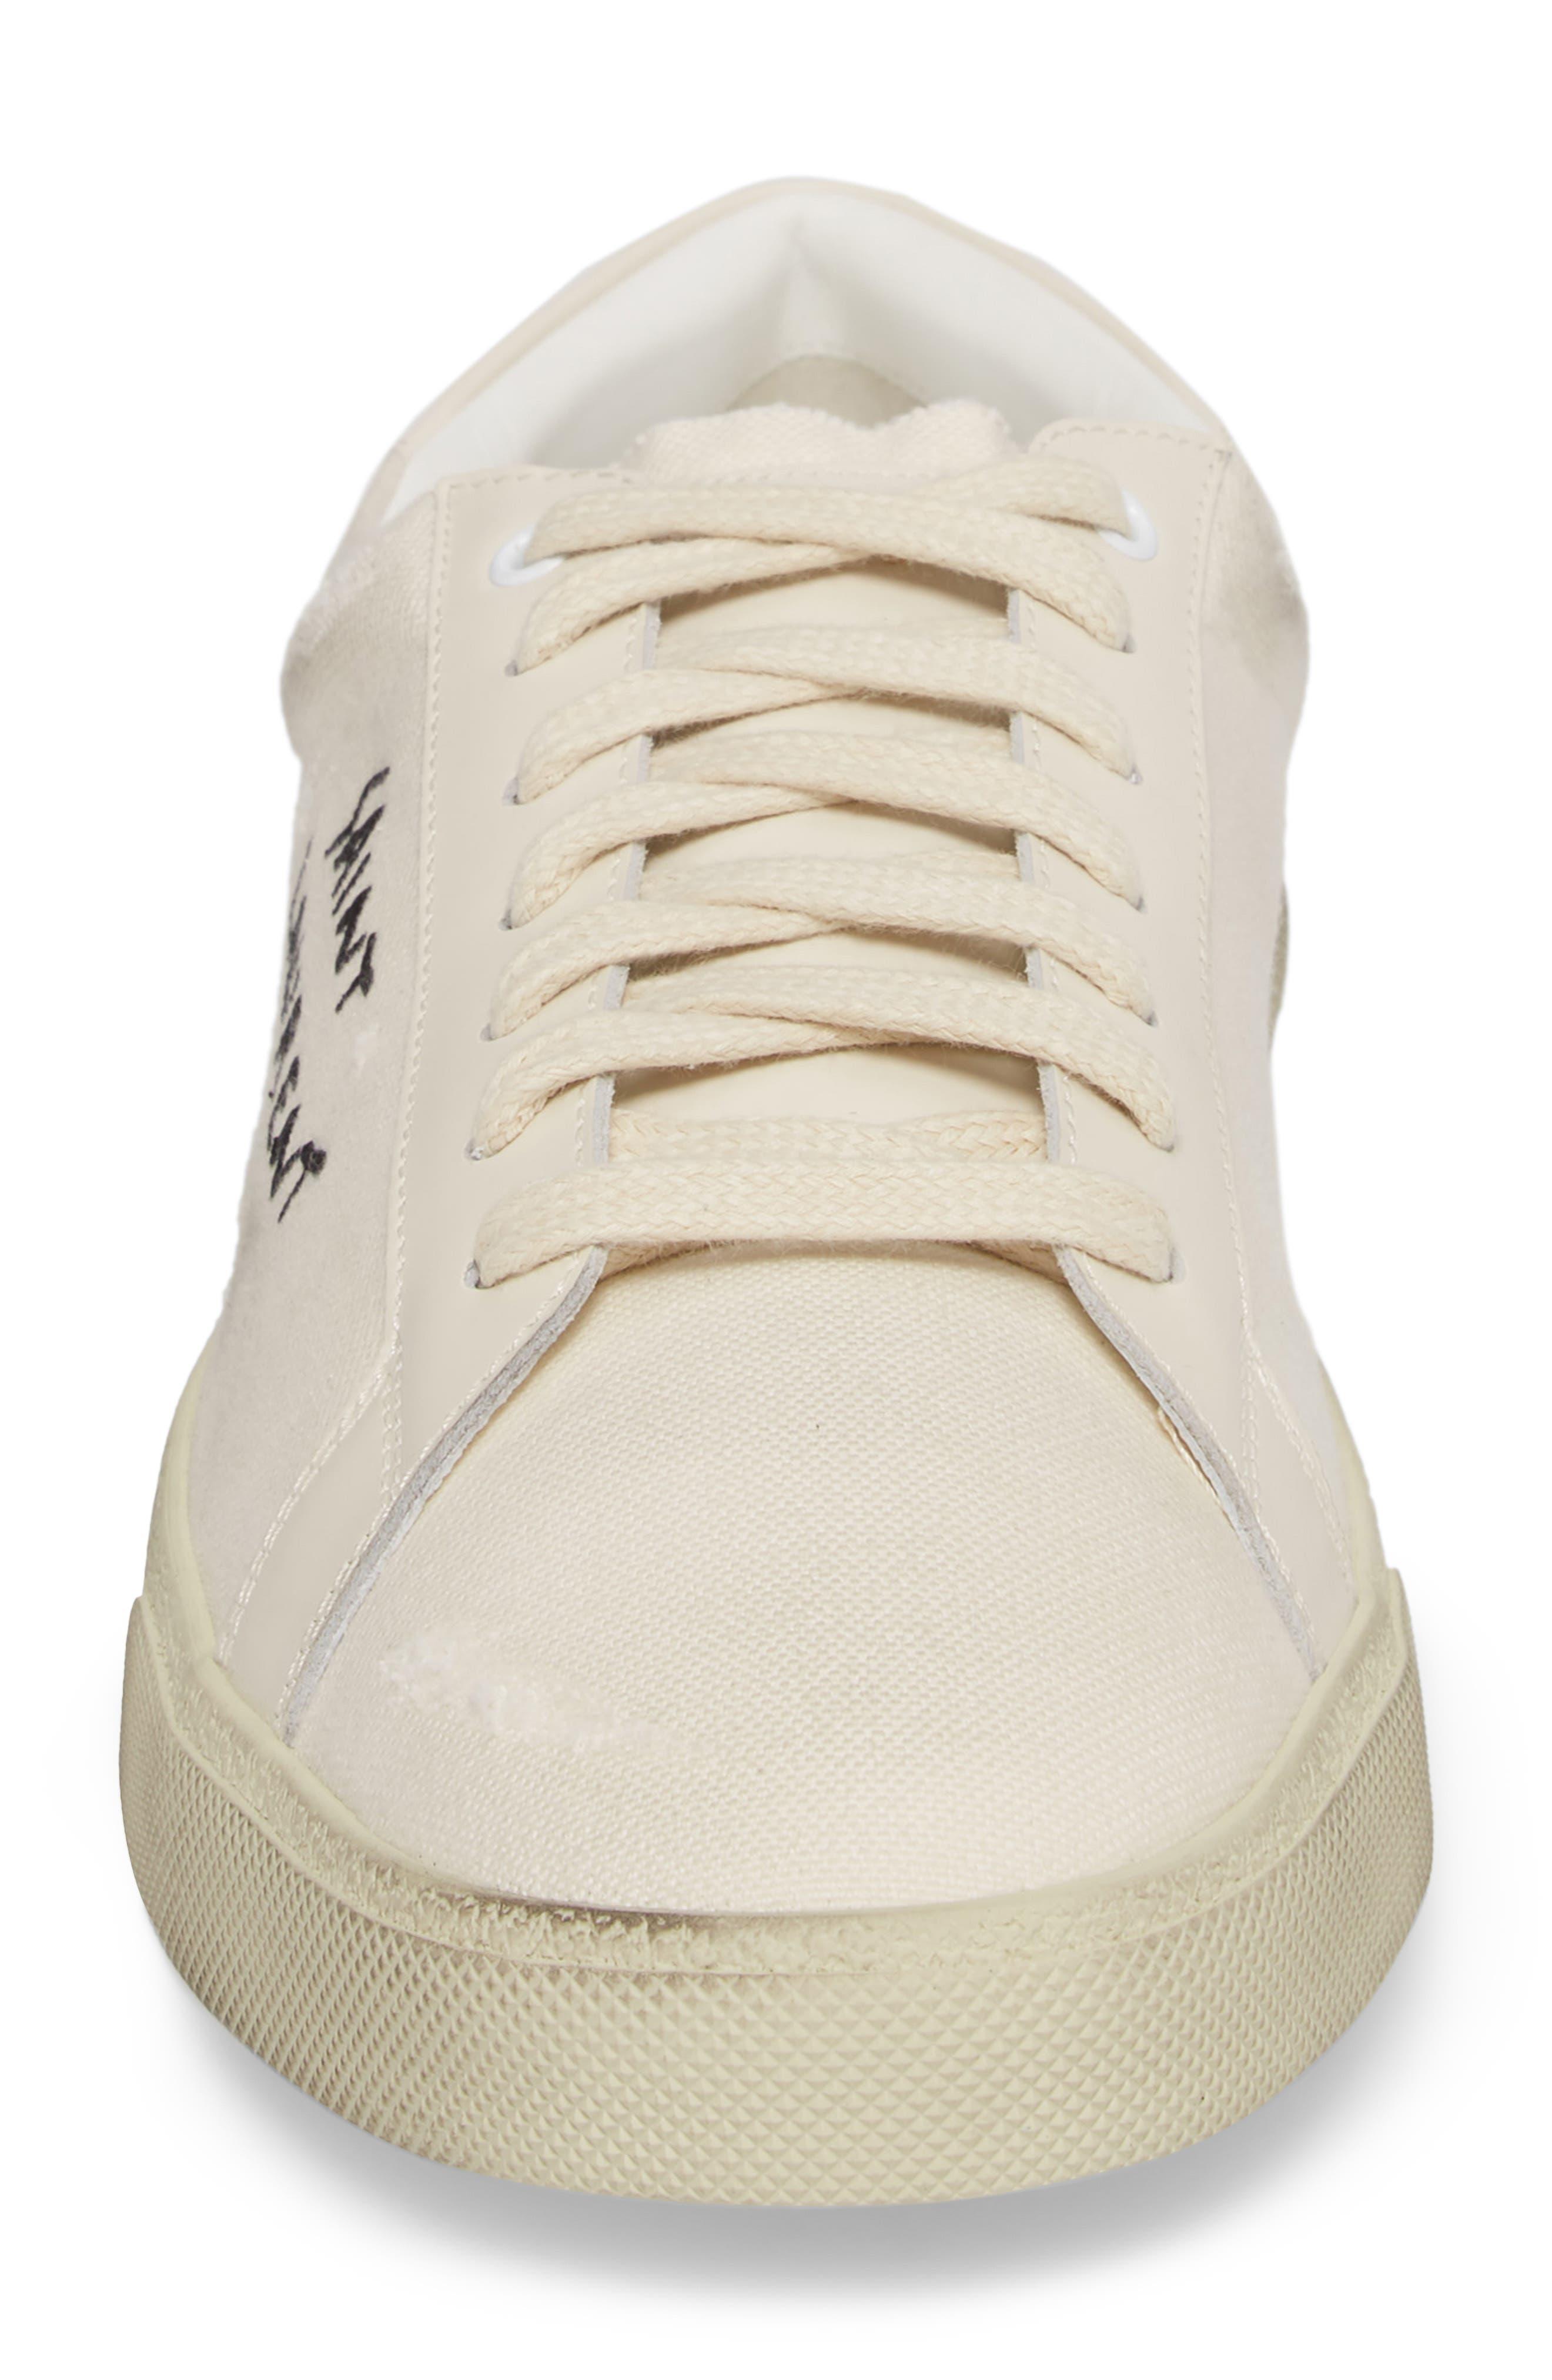 SAINT LAURENT, Logo Embroidered Sneaker, Alternate thumbnail 4, color, 9113 PANNA/PANNA